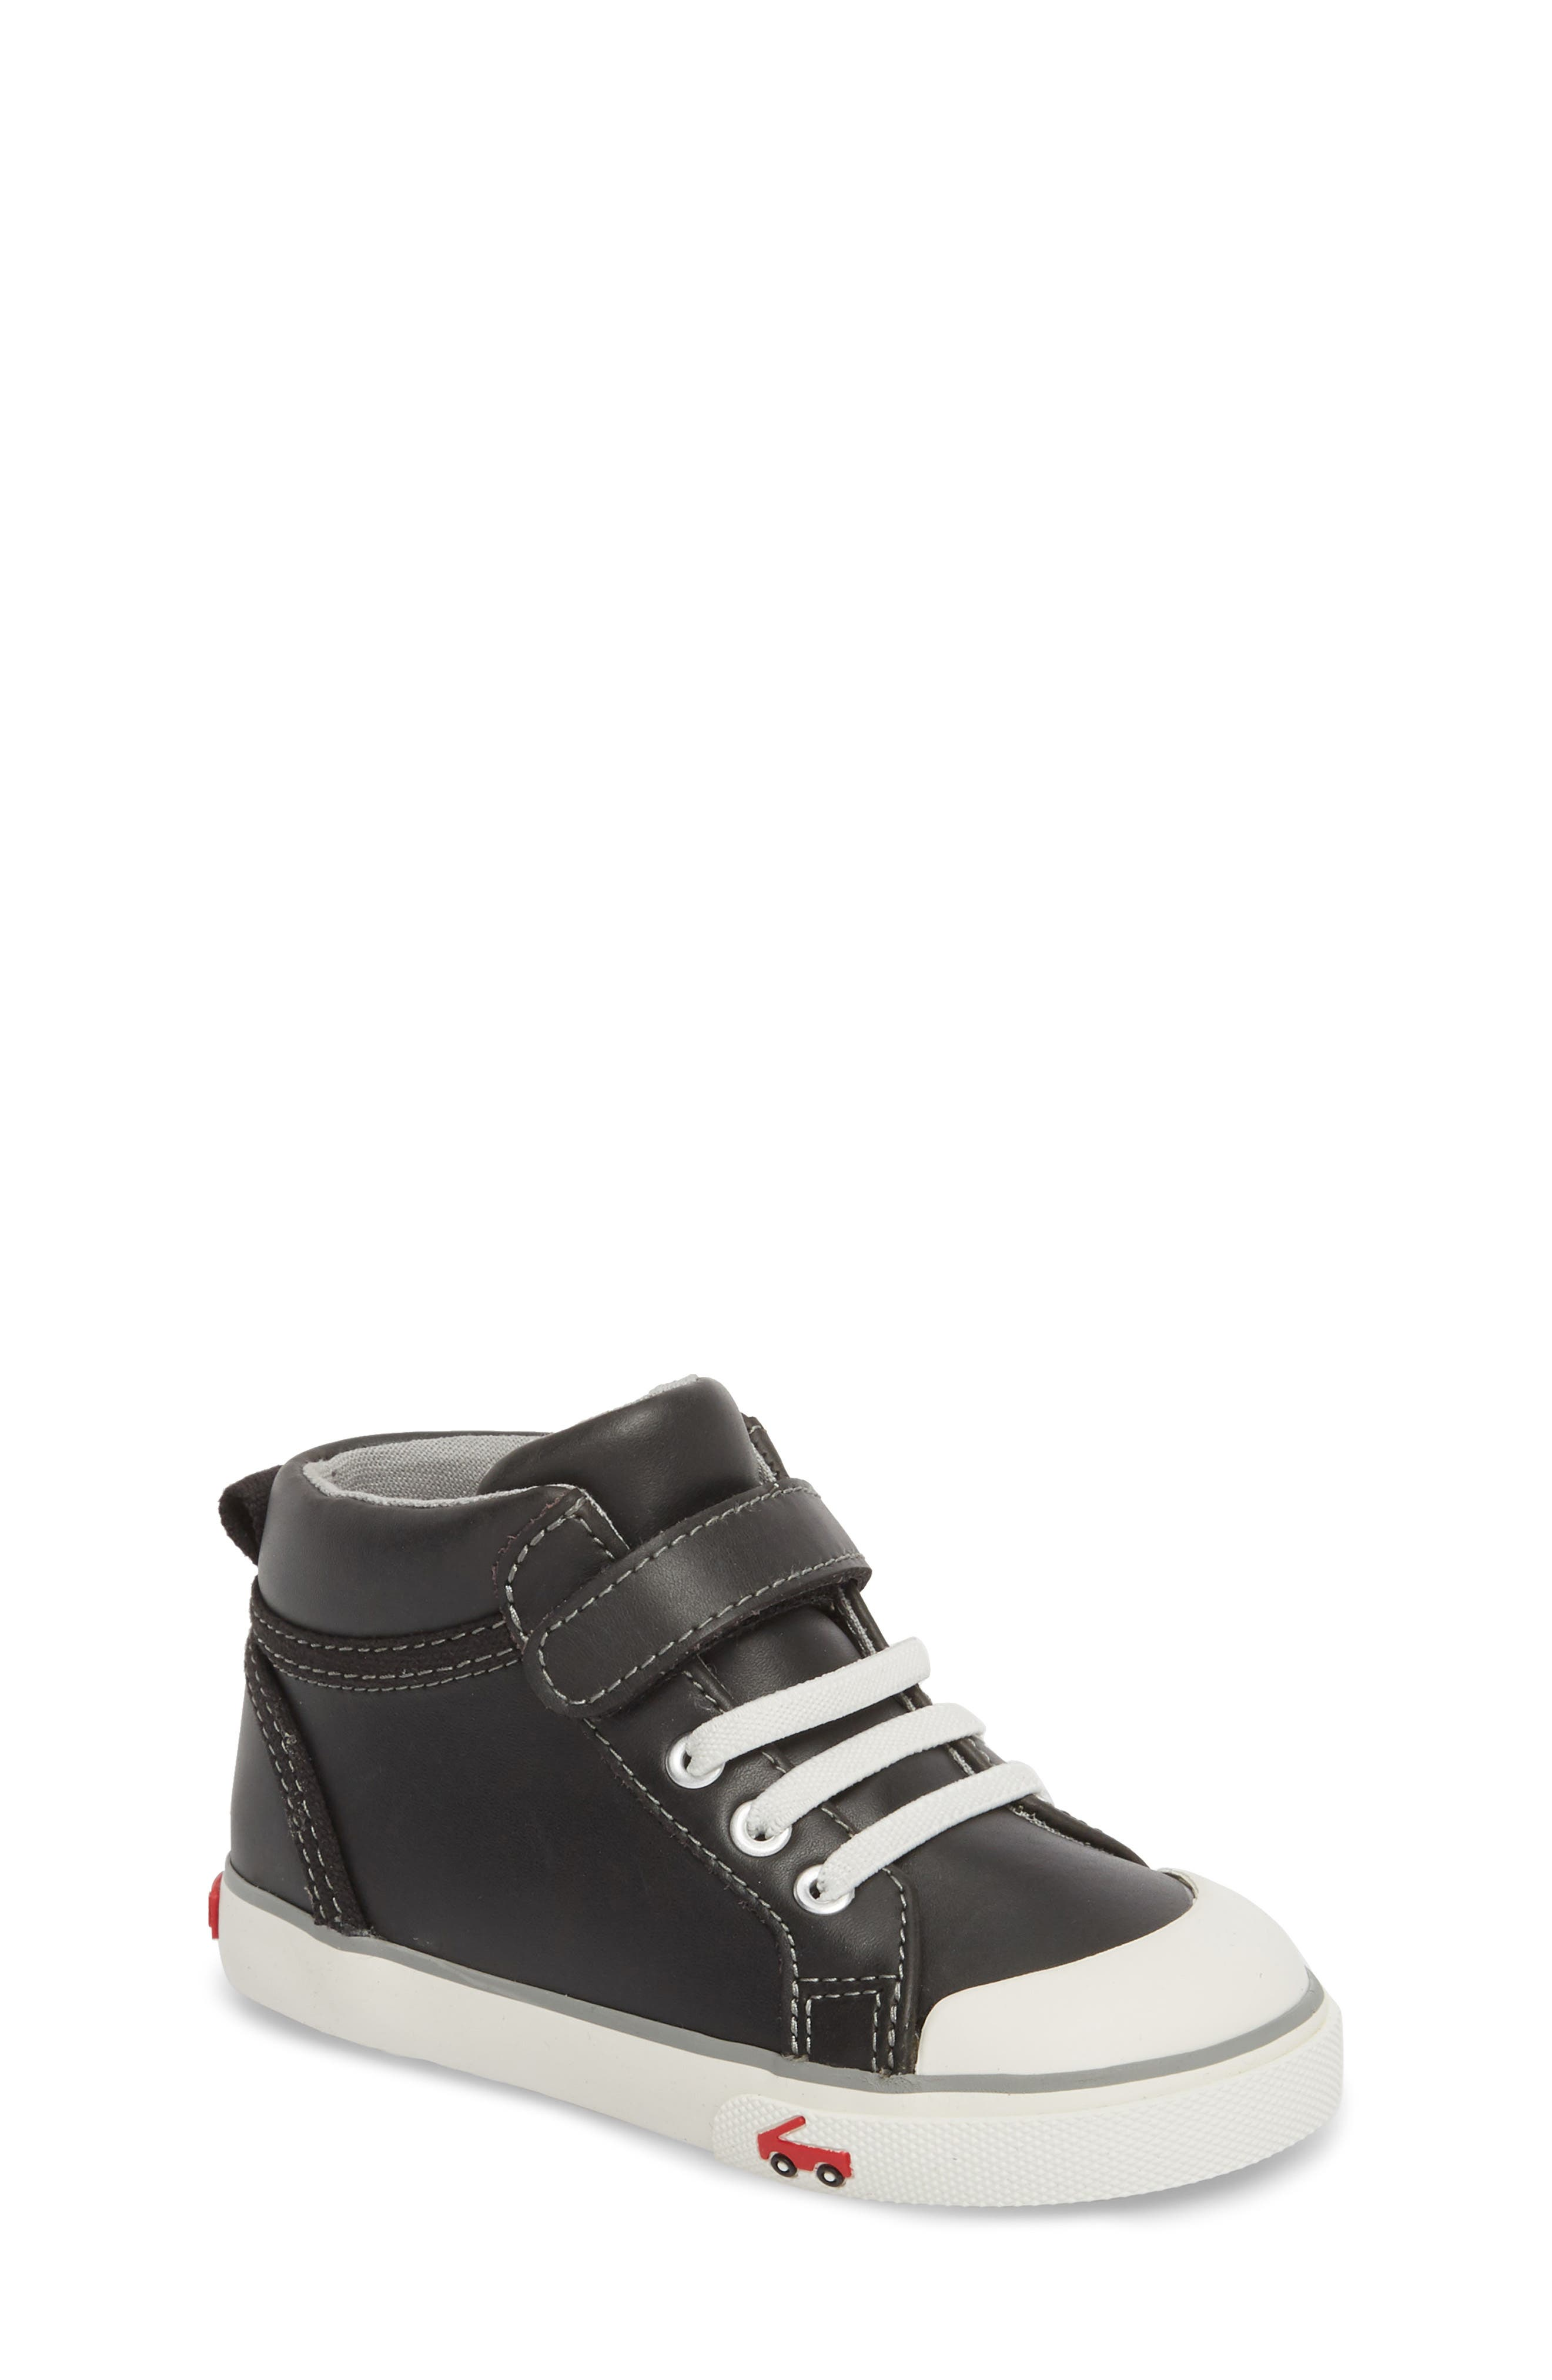 SEE KAI RUN Peyton High Top Sneaker, Main, color, BLACK LEATHER